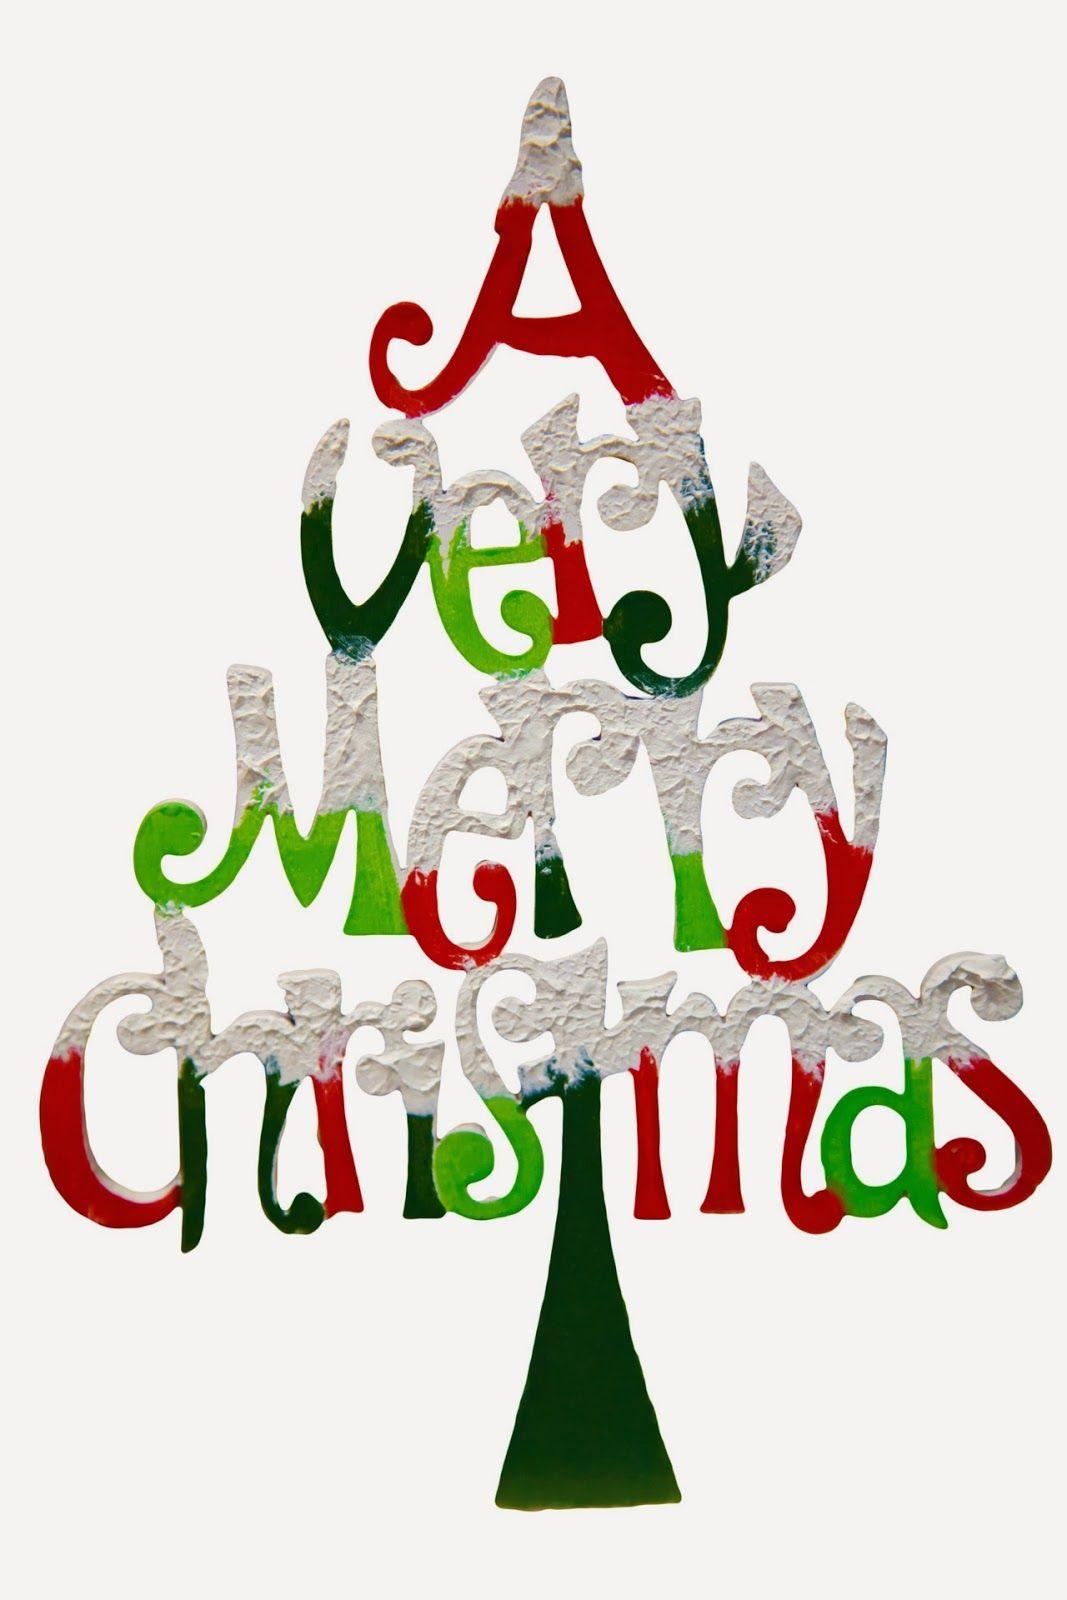 merry christmas clip art merry christmas tree merry christmas rh pinterest com